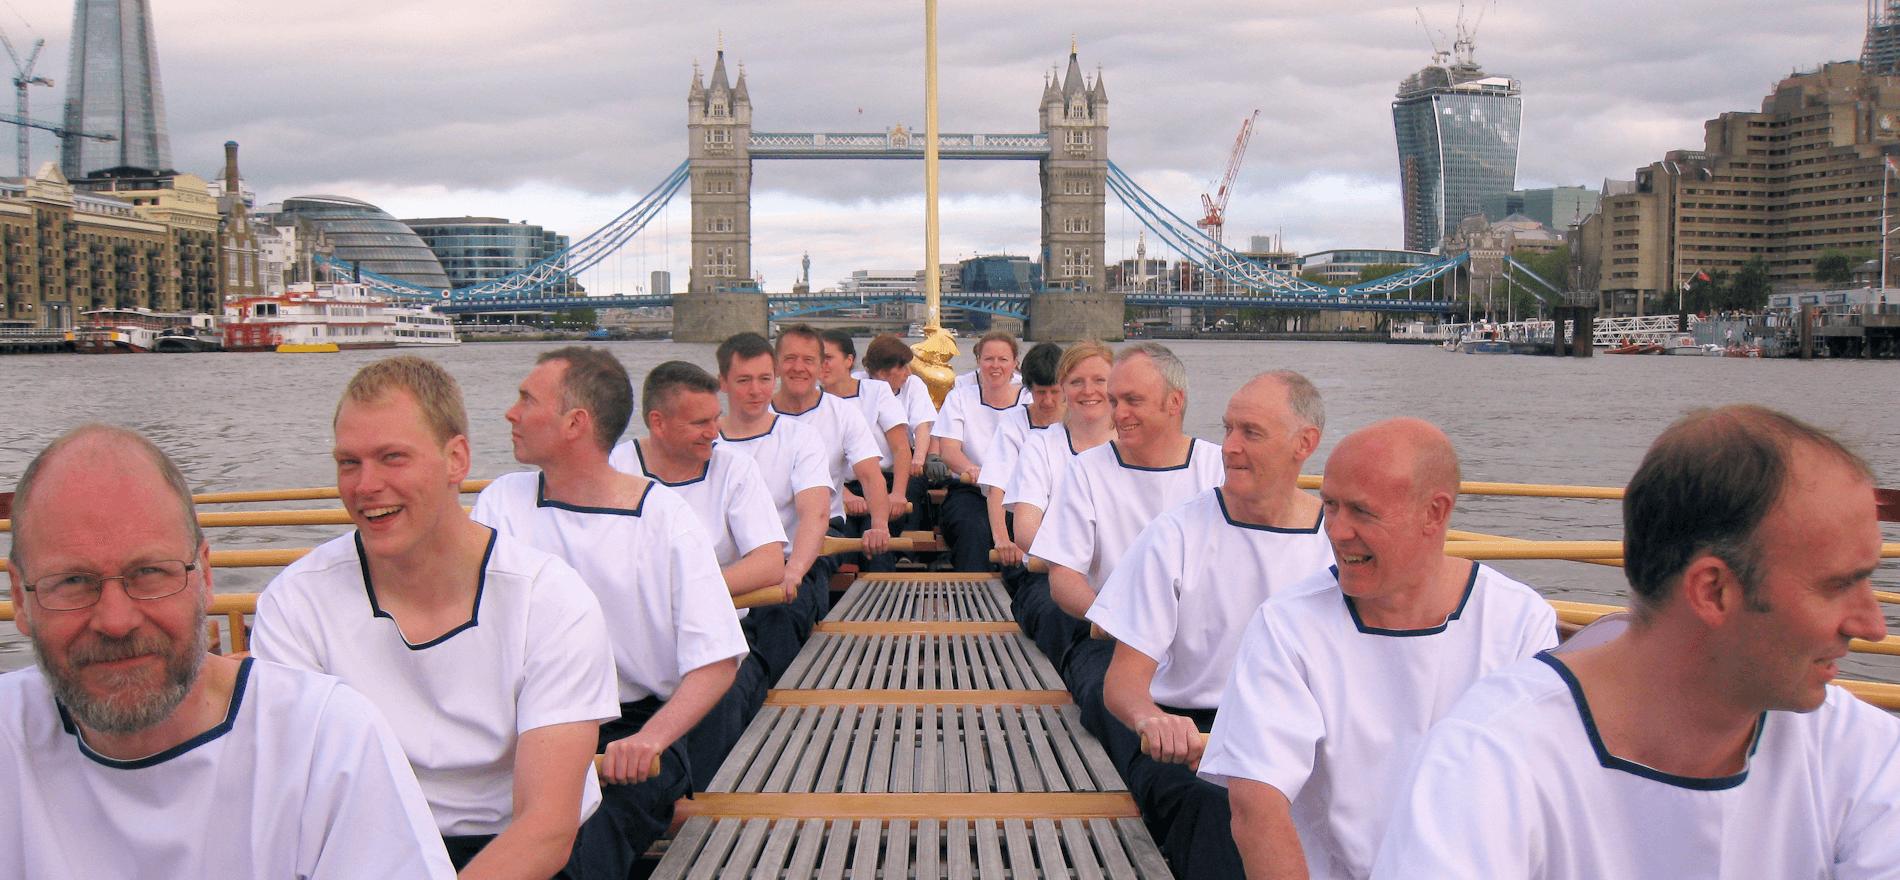 RNR HMS President Crew Tower Bridge rowing Gloriana